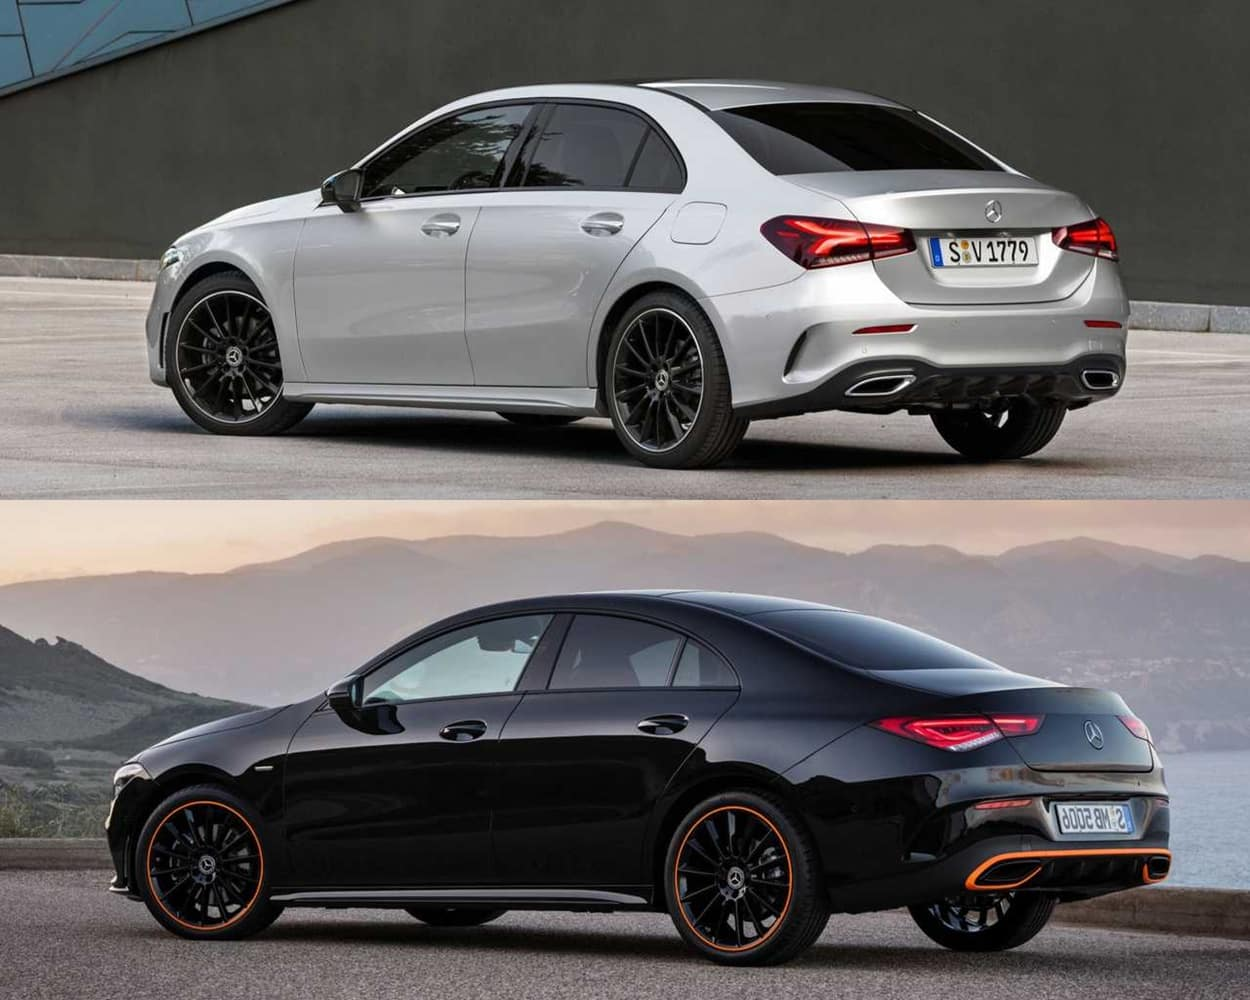 Mercedes Benz Cla >> Comparativa visual Mercedes-Benz CLA vs. Clase A Sedán 2019